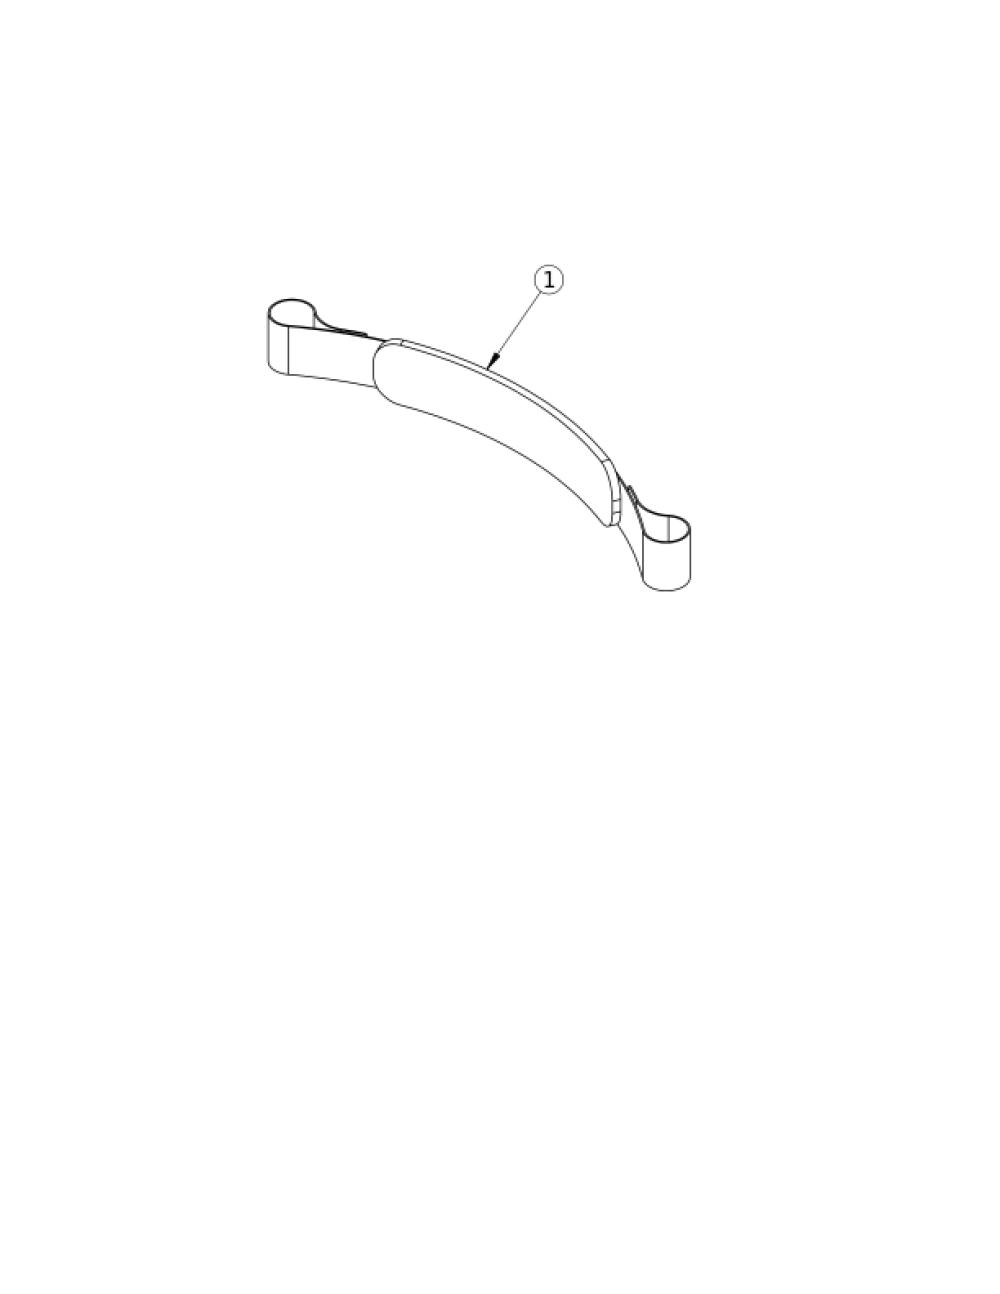 Padded Hook And Loop Adjustable Calf Strap parts diagram